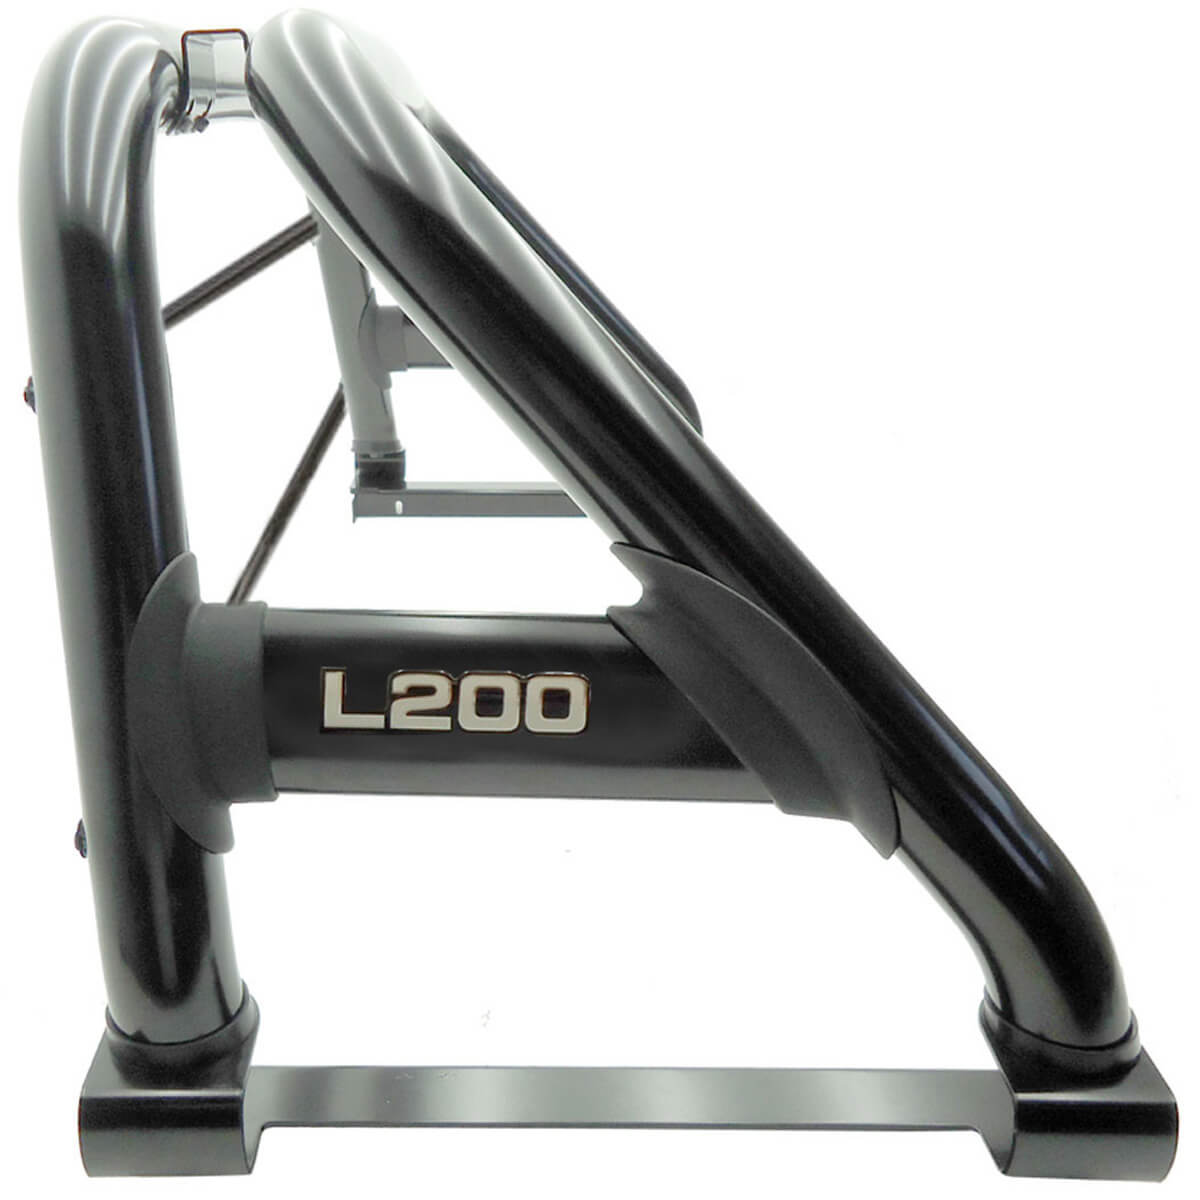 Santo antônio duplo preto L200 GL 1999 a 2005 ou L200 GLS 1999 a 2007 com barras de vidro